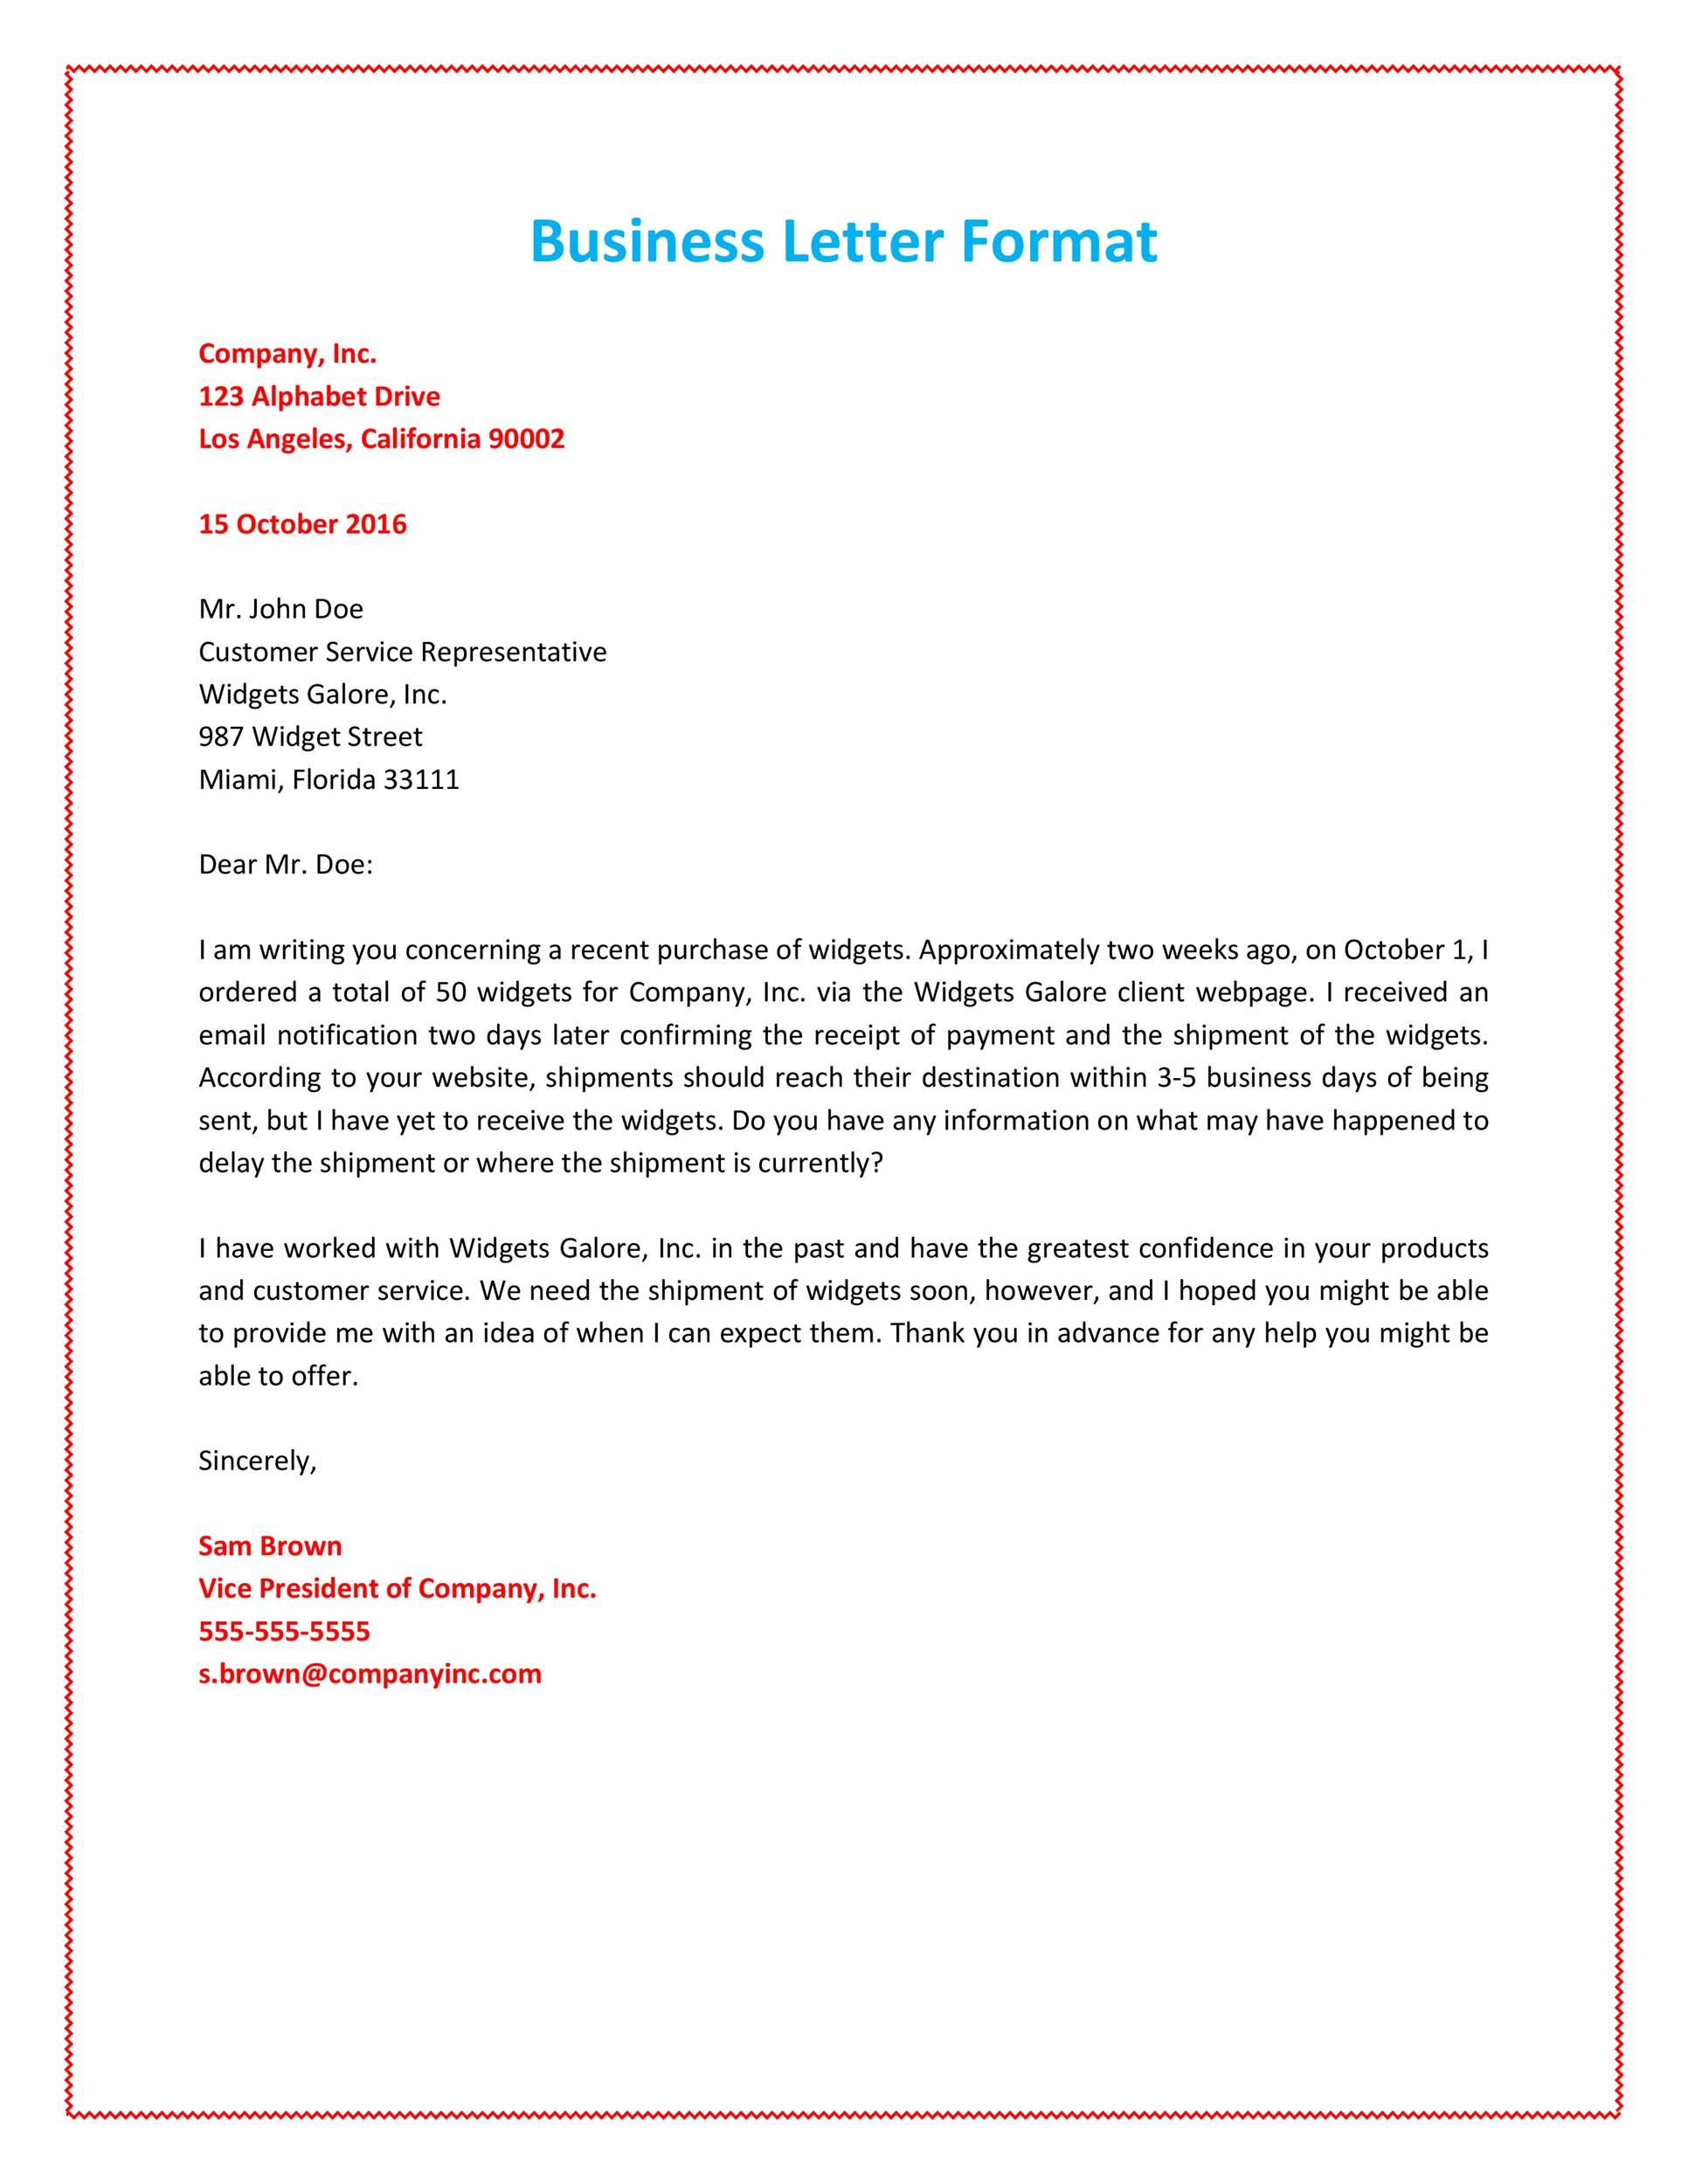 004 Striking Sample Busines Letter Template Photo  Of Intent Formal FreeFull